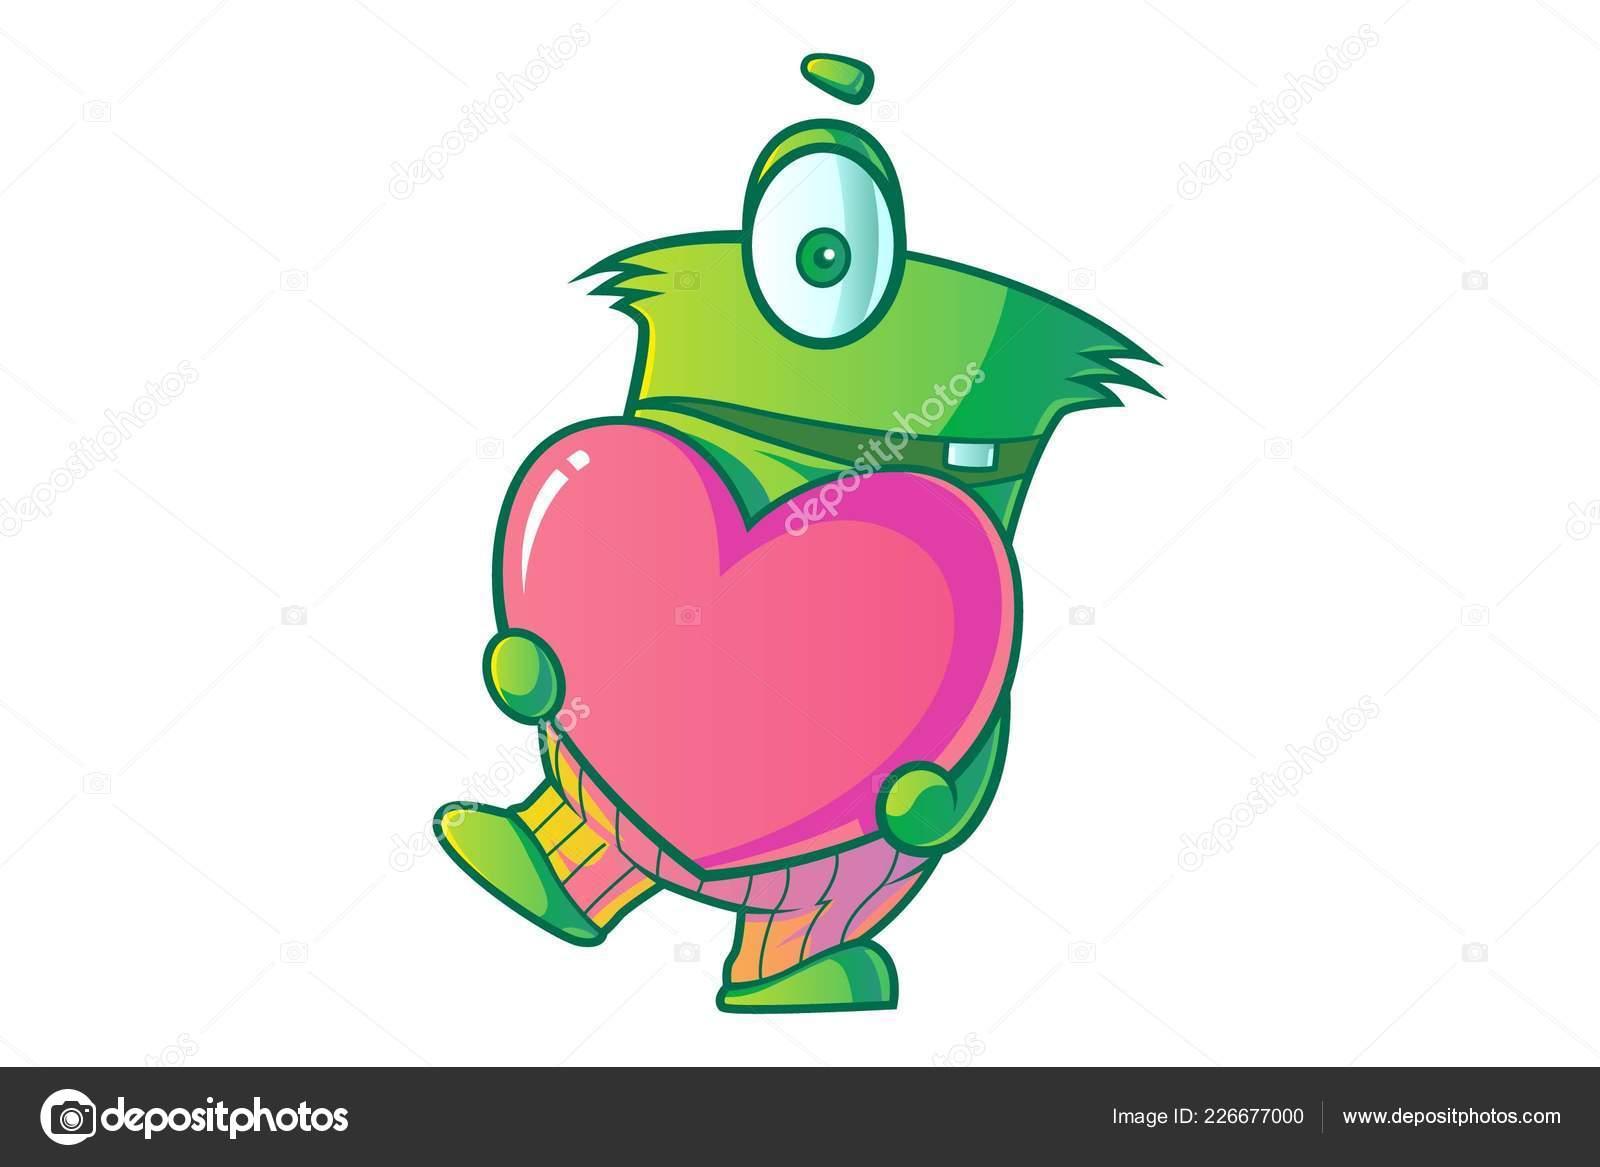 hight resolution of vector cartoon illustration cute green single eye monster heart isolated stock vector